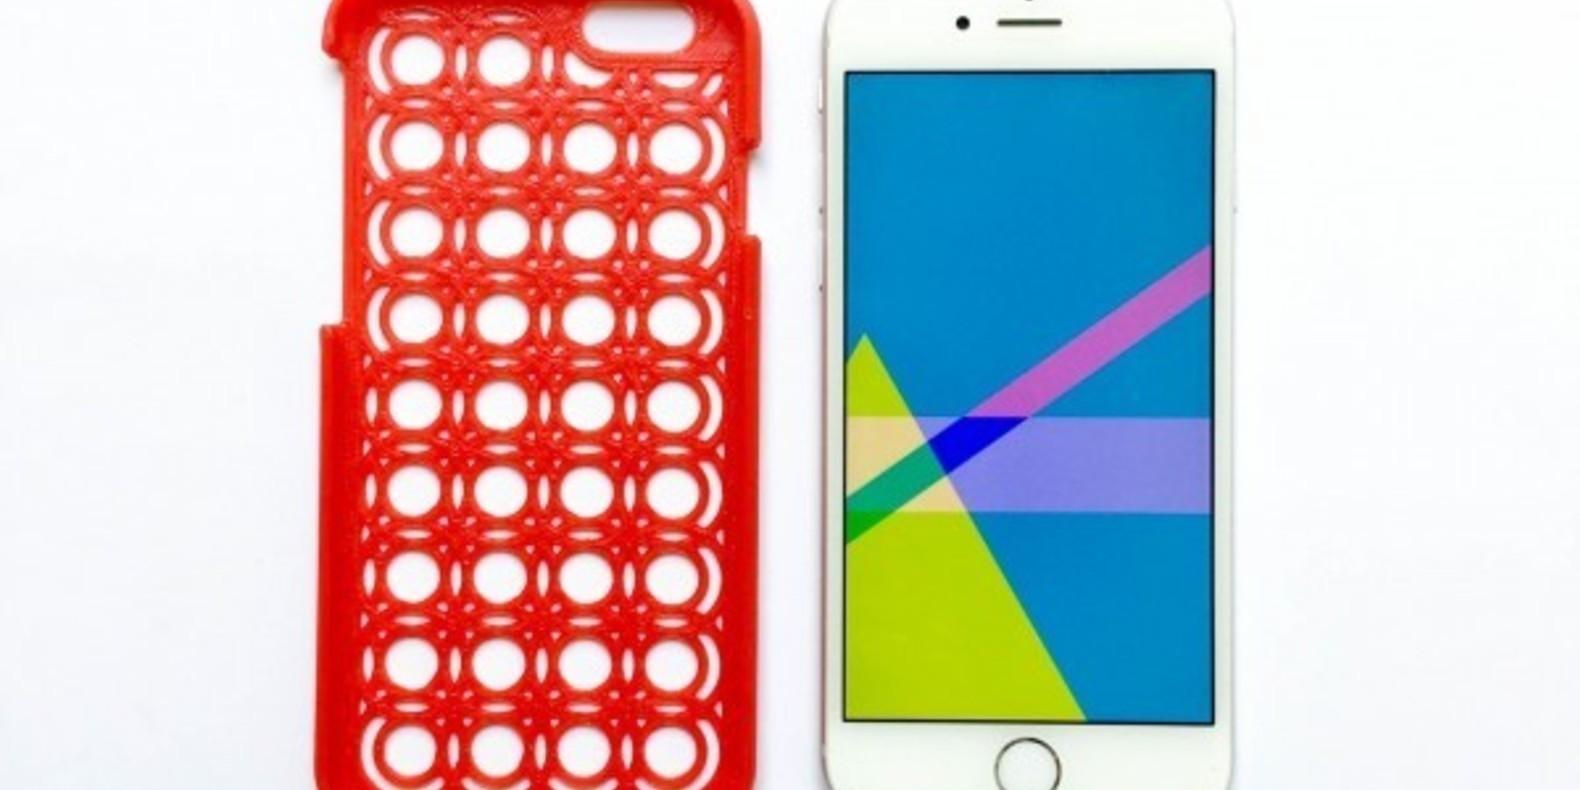 3DNG cults fichier 3D coques d'iphone imprimée en 3D 3D printed